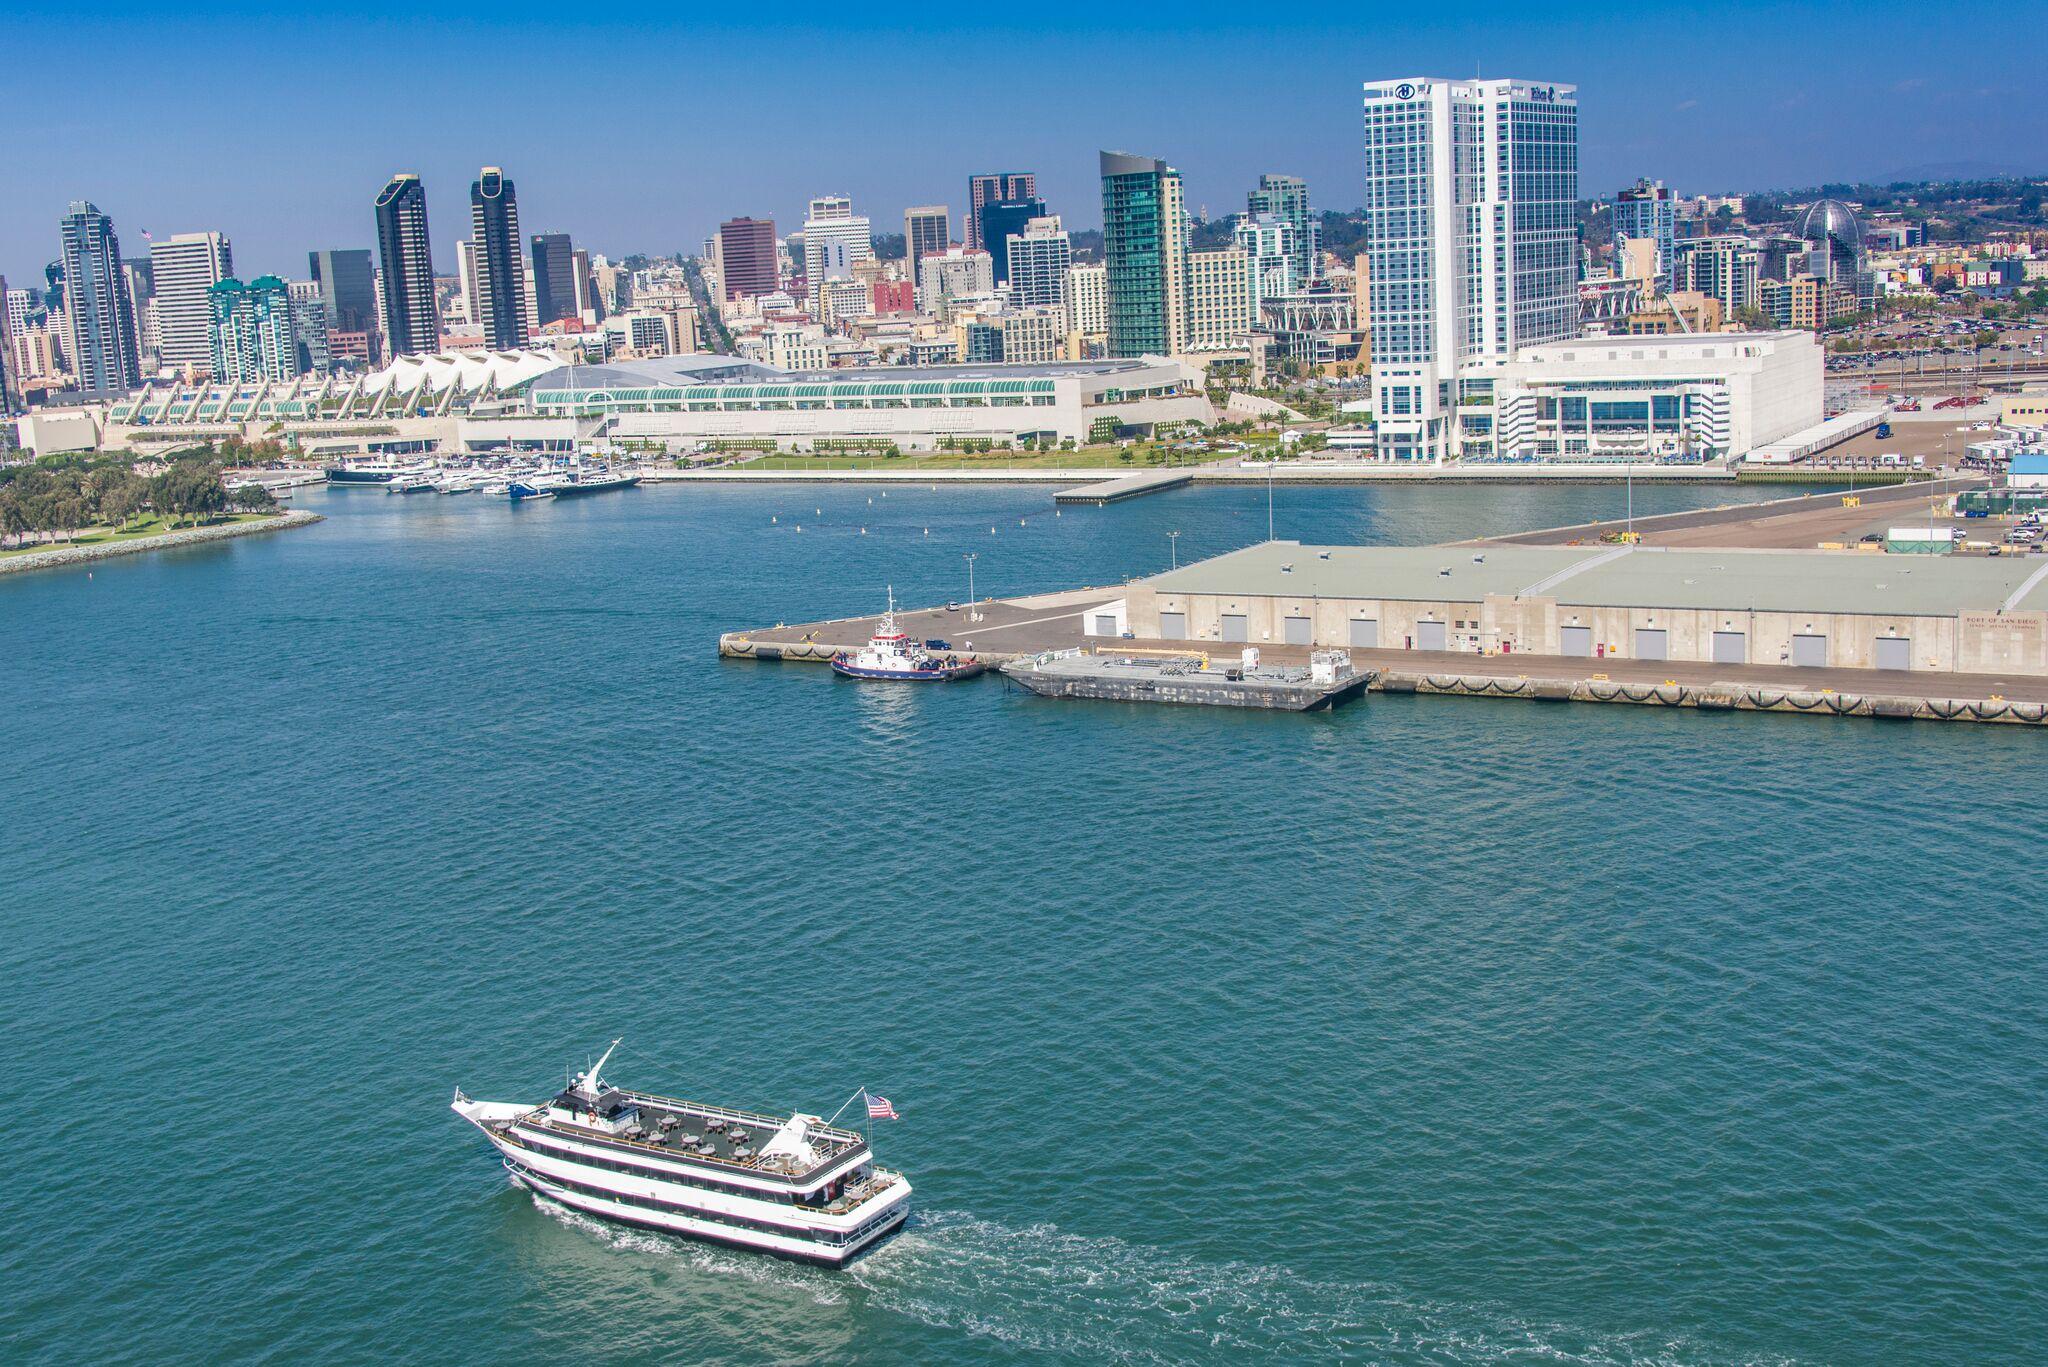 Tours From Boston Harbor